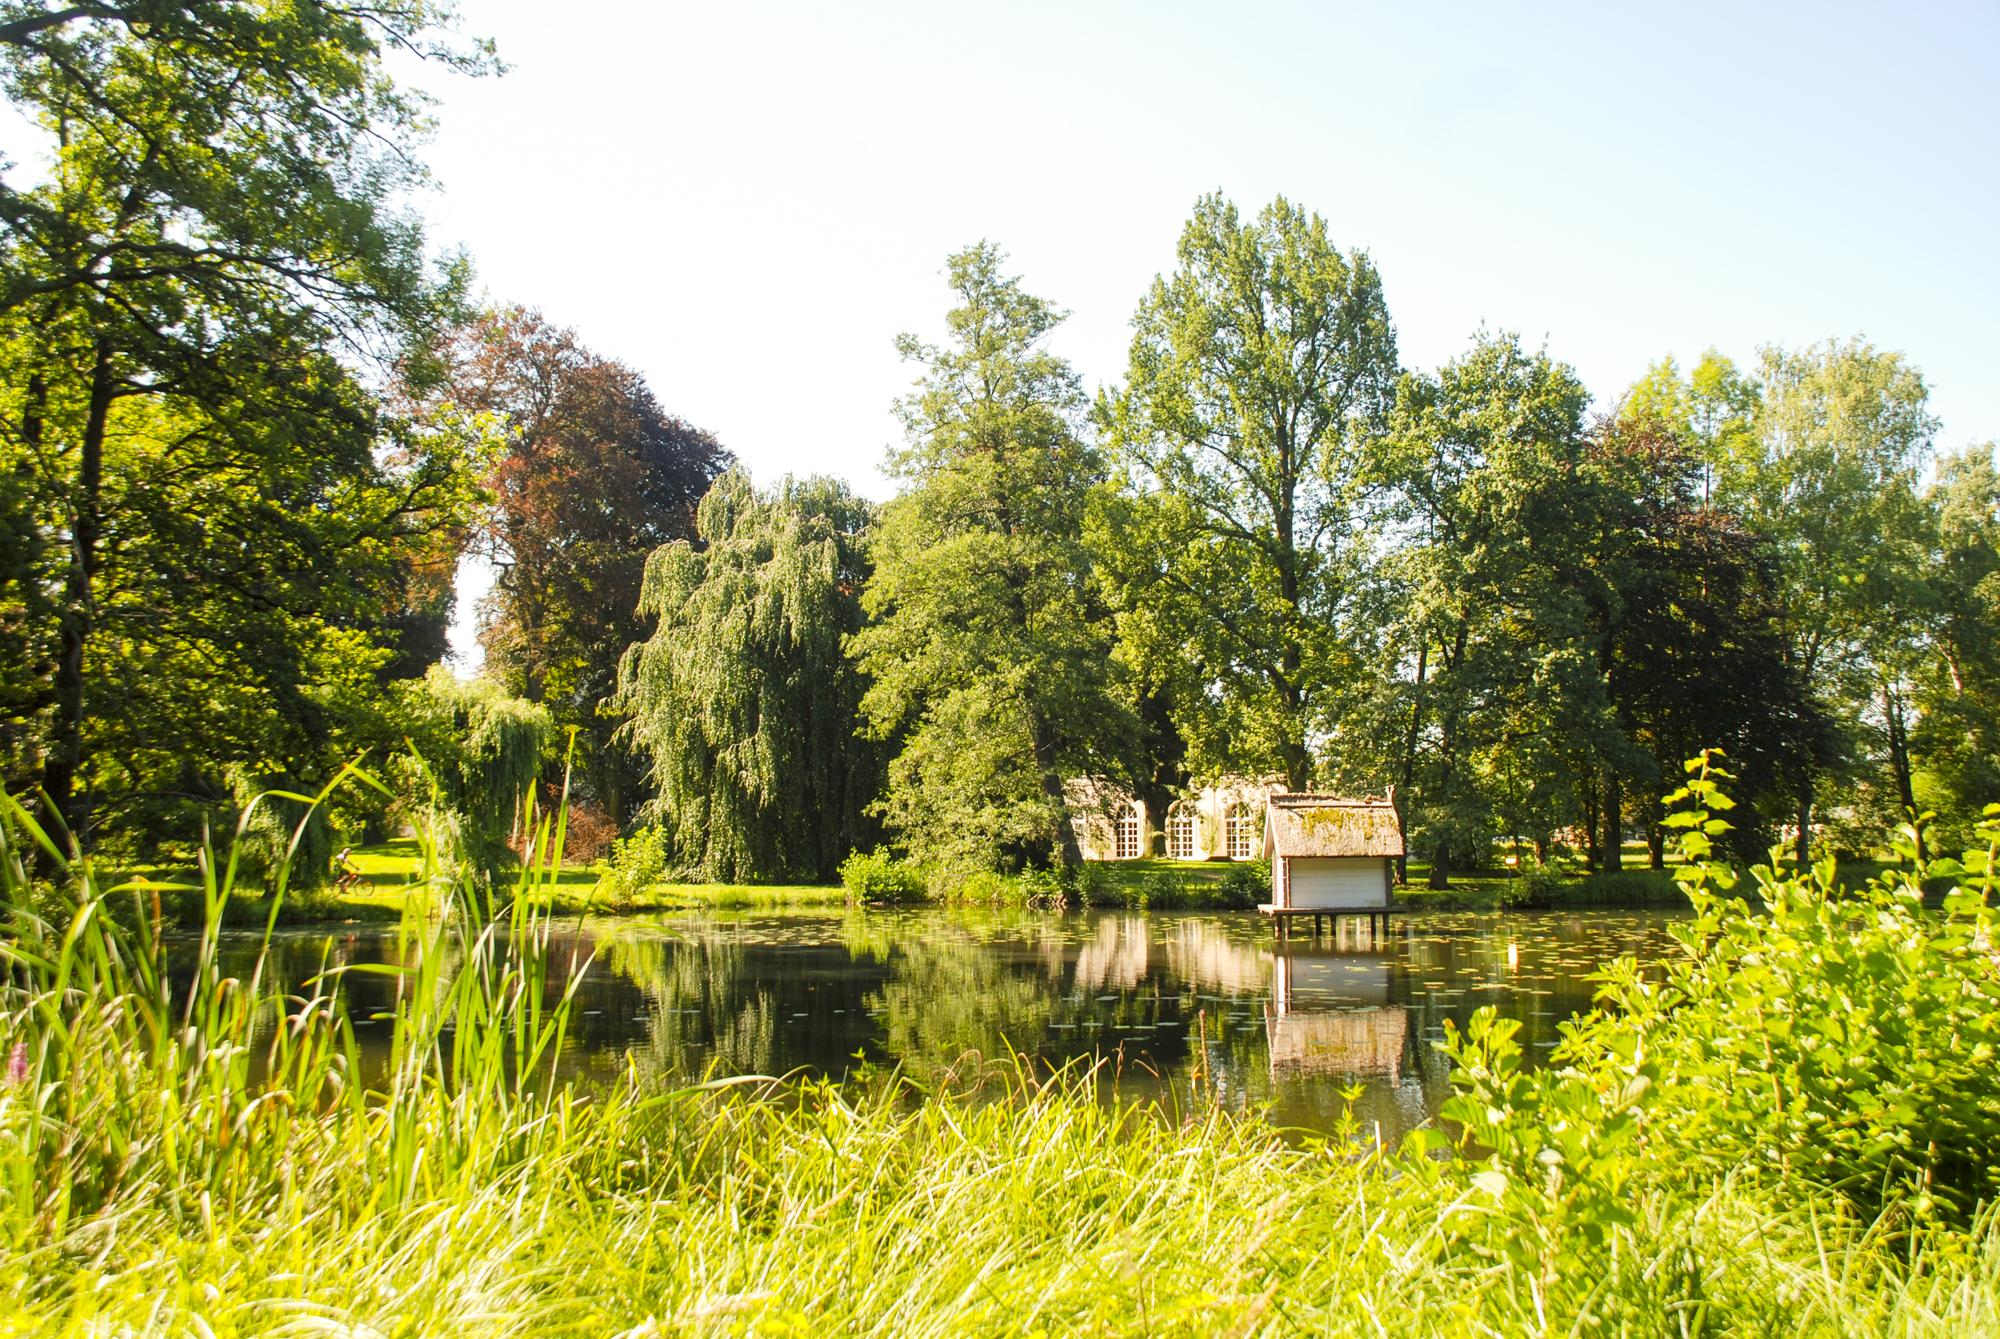 Urlaub Spreewald - Schlosshotel Brandenburg - Spreewald erleben - Schloss Lübbenau im Spreewald